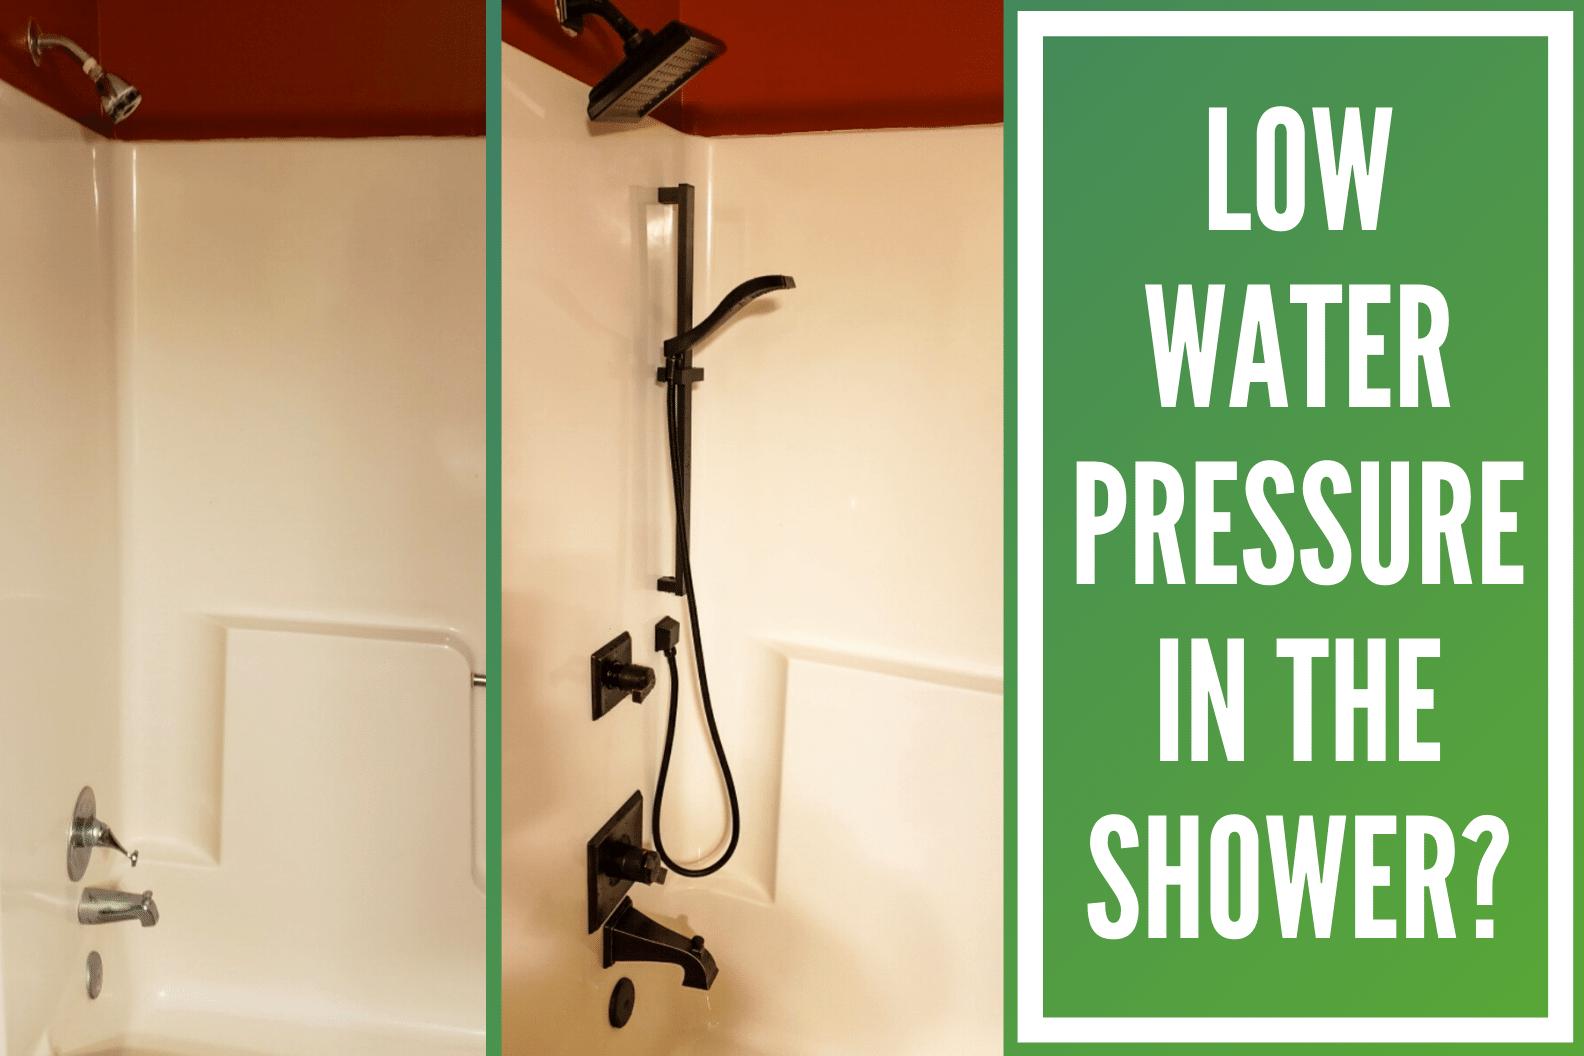 Low Water Pressure - Shower